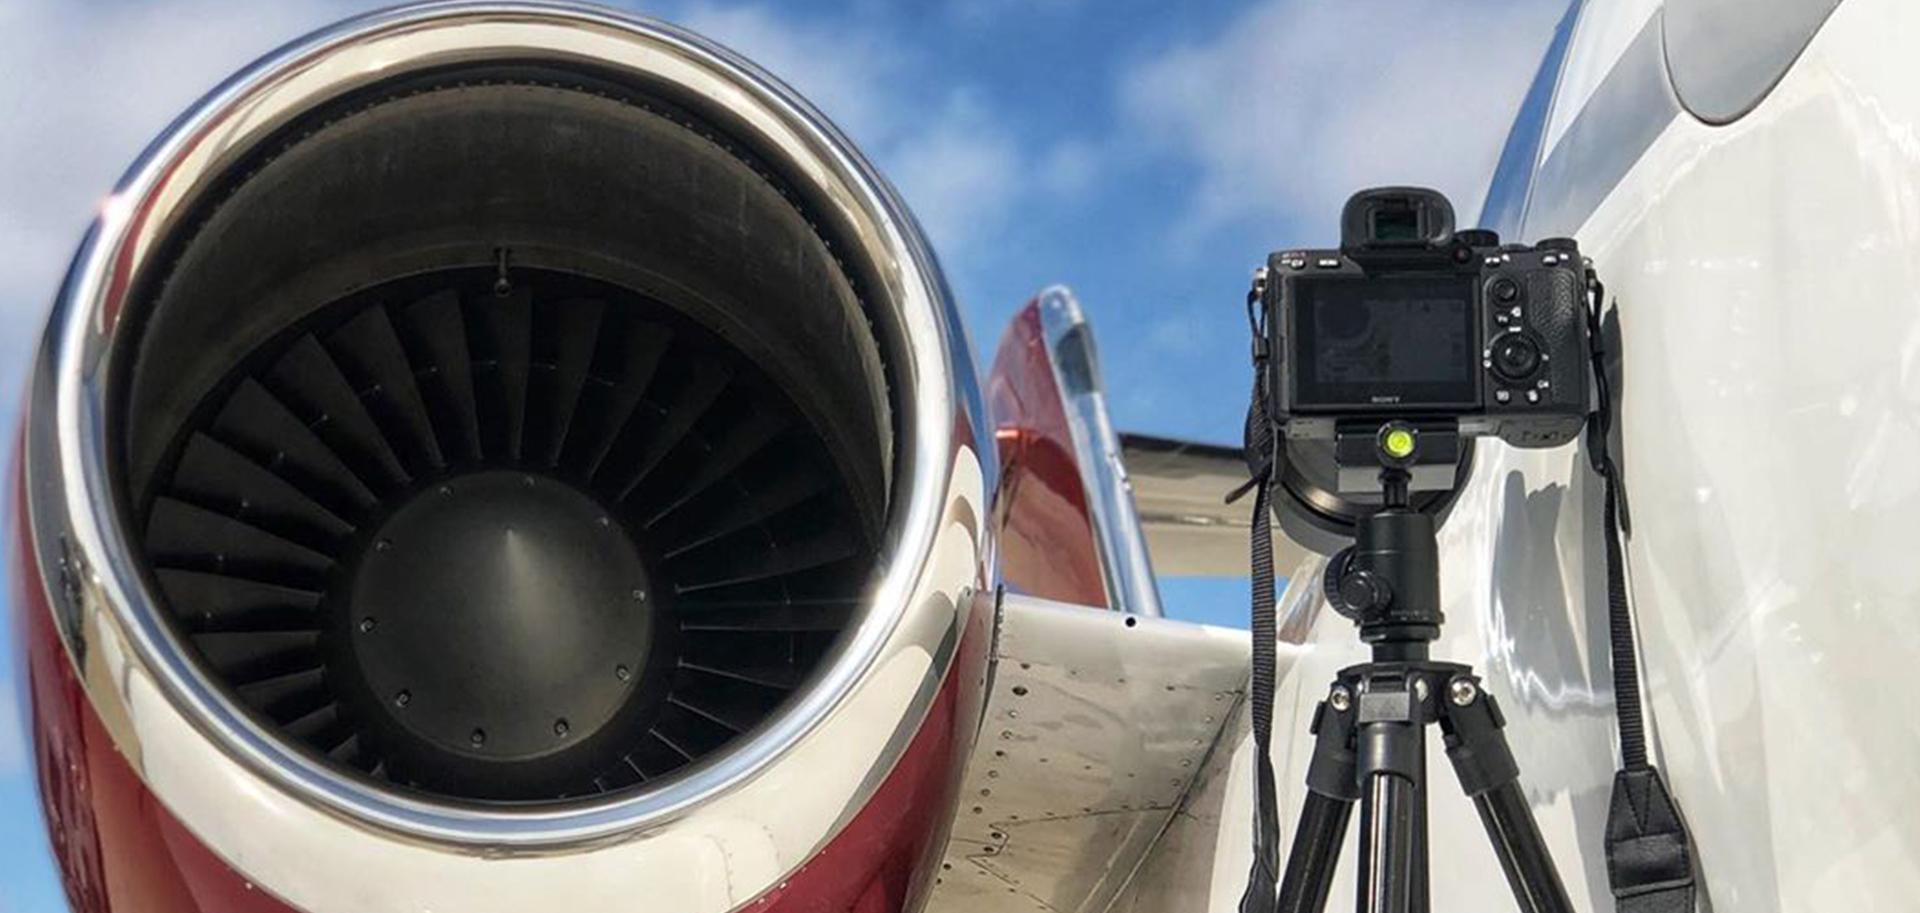 aircraft media services